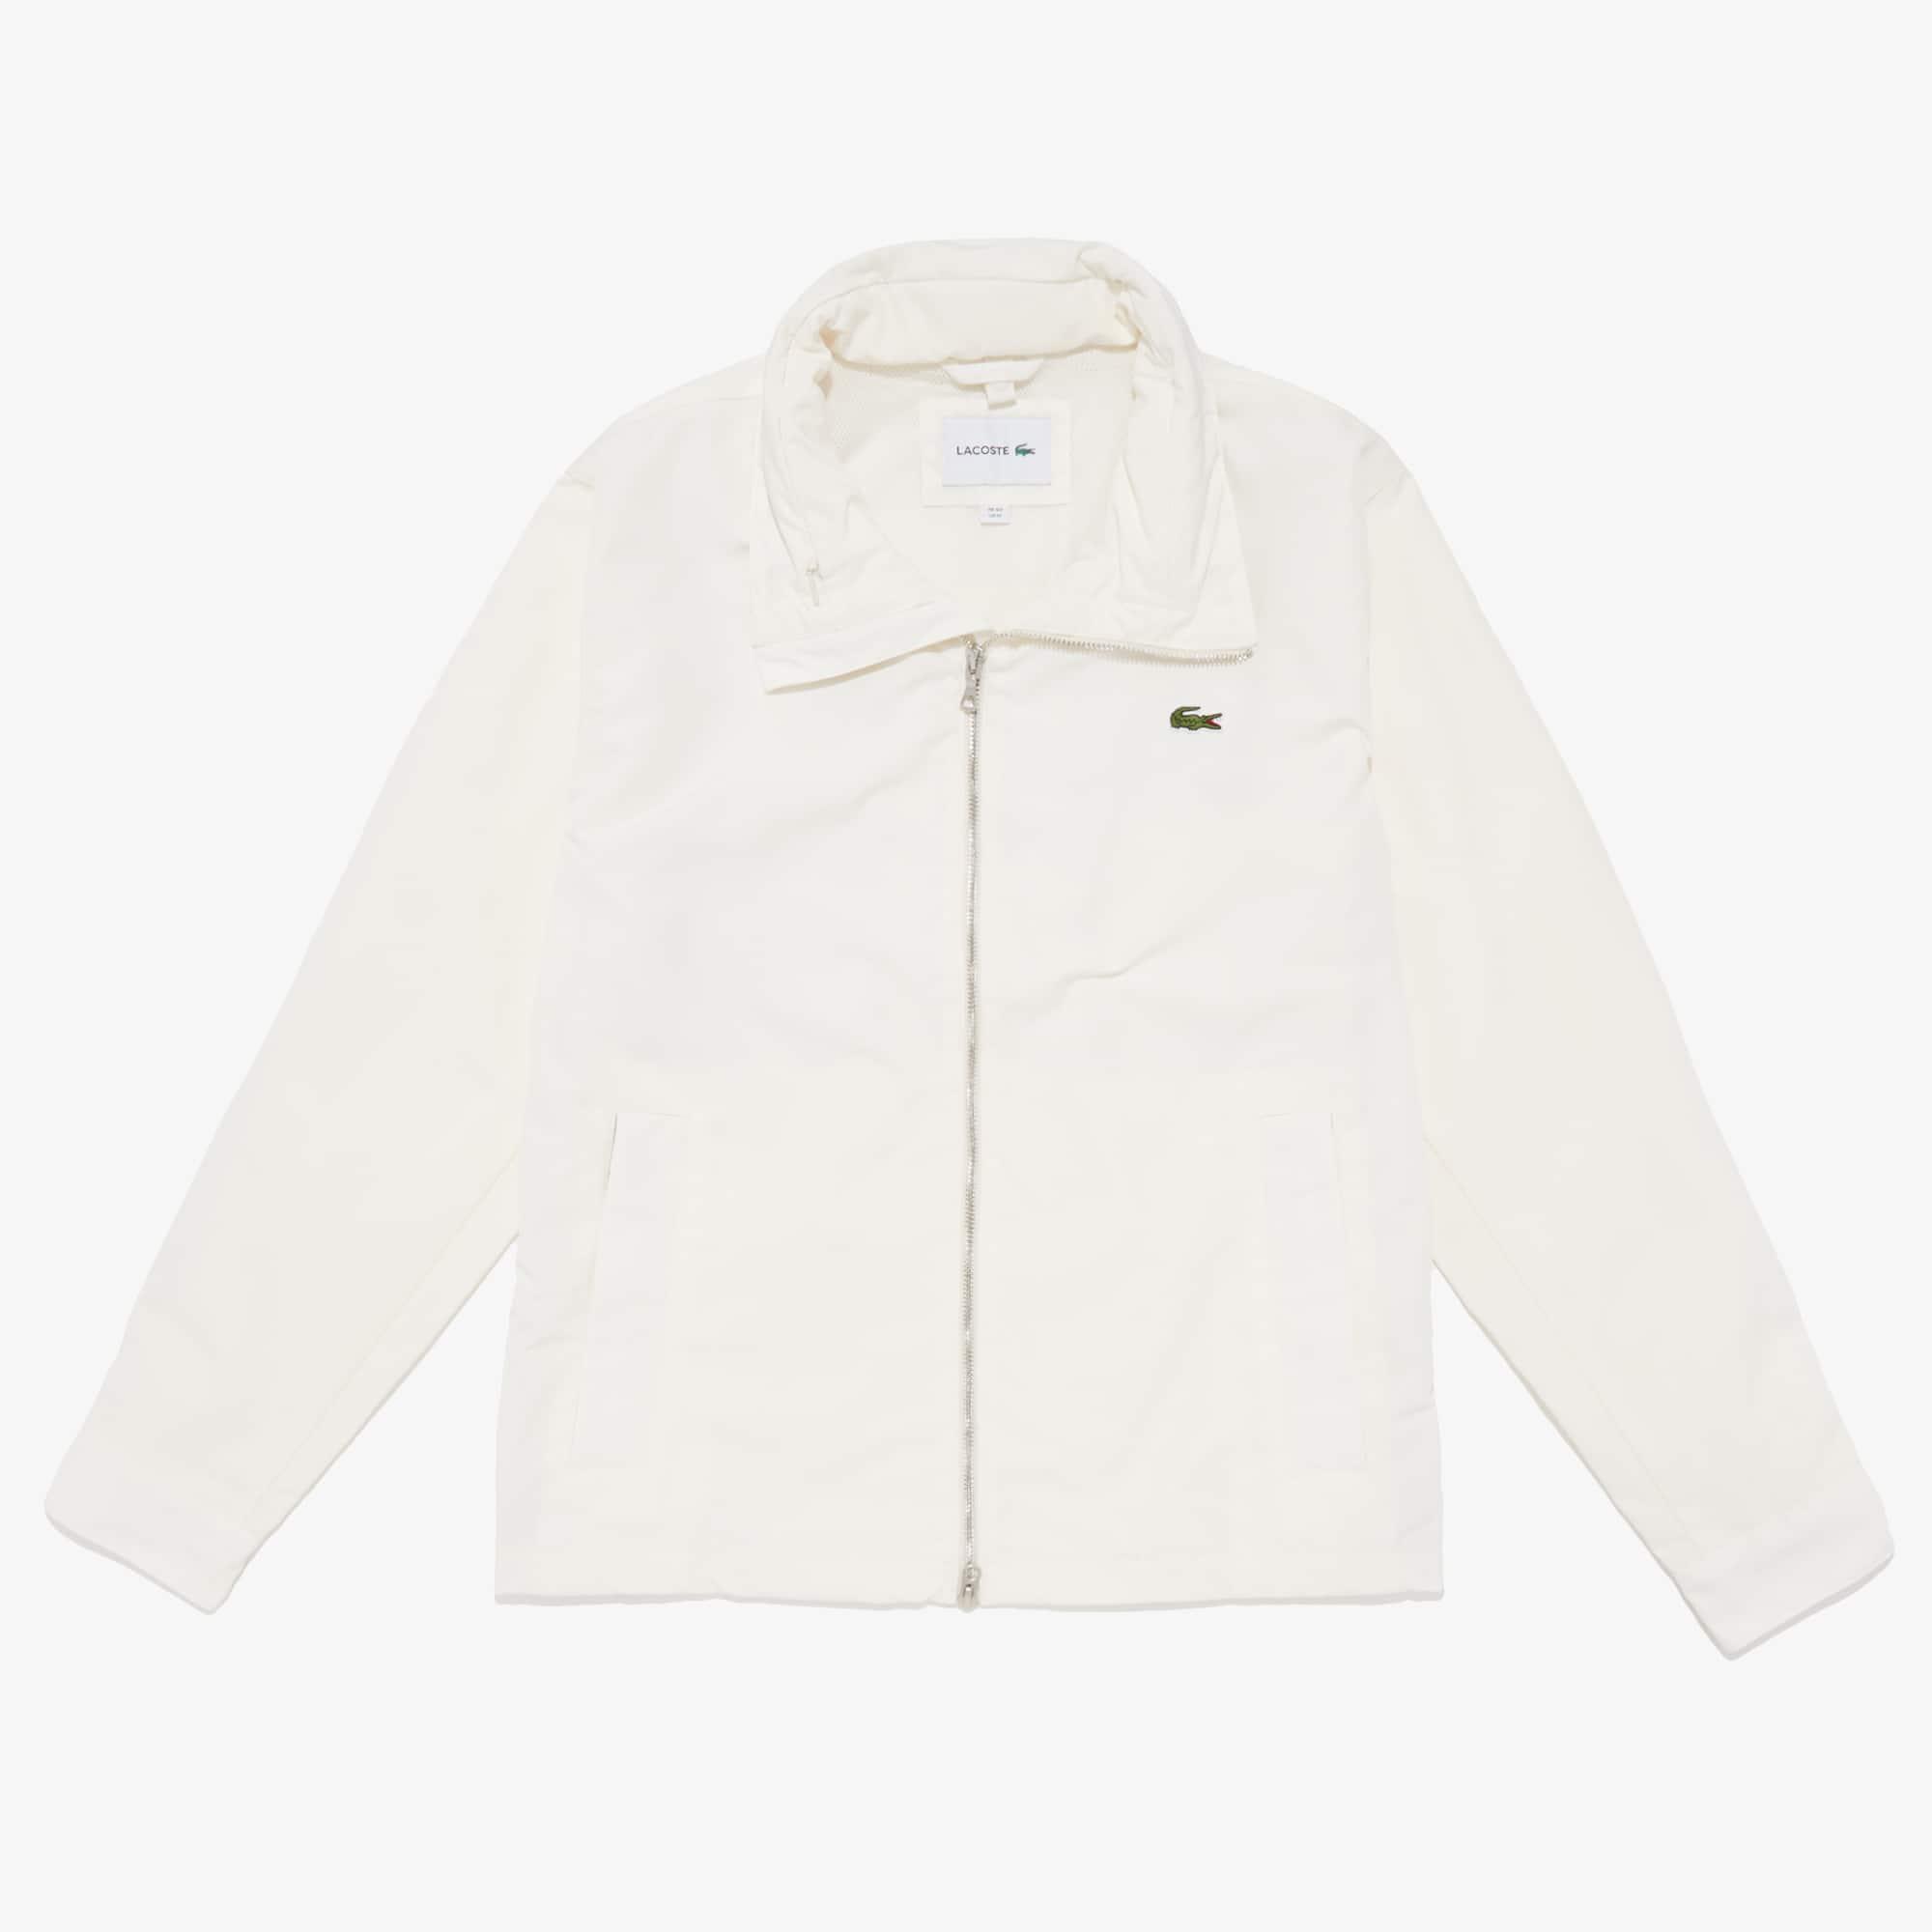 Men's Hooded Weather-Adaptable Windbreaker Jacket